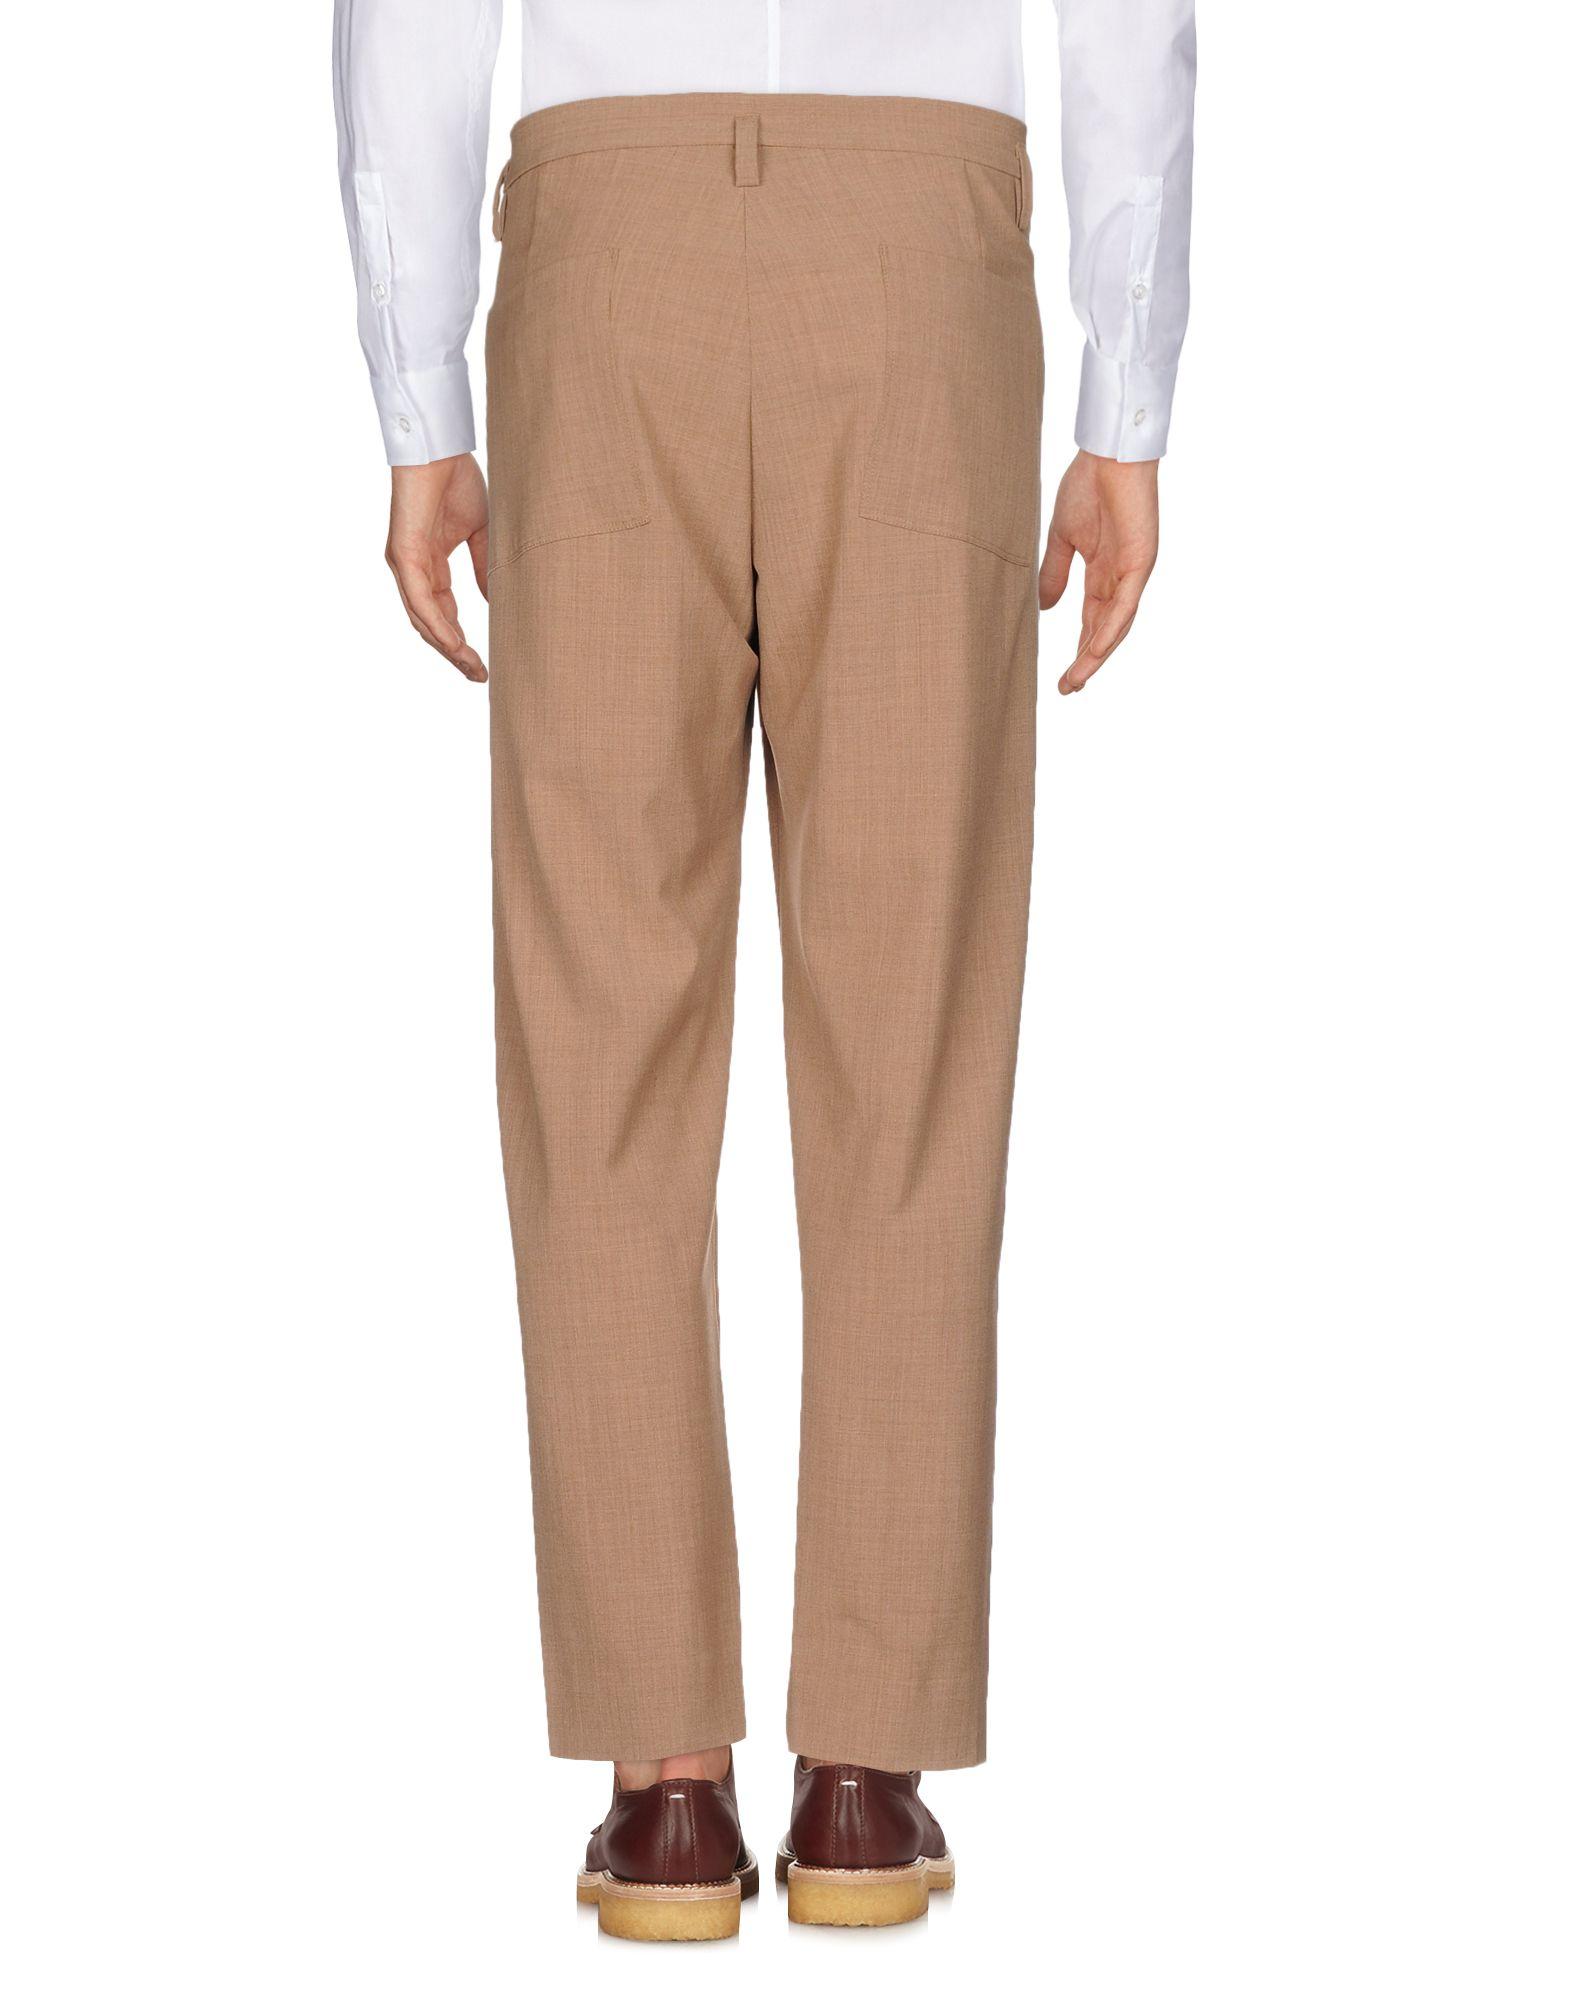 Pantalone Maison Maison Maison Flaneur Uomo - 13164277KK 3e8928